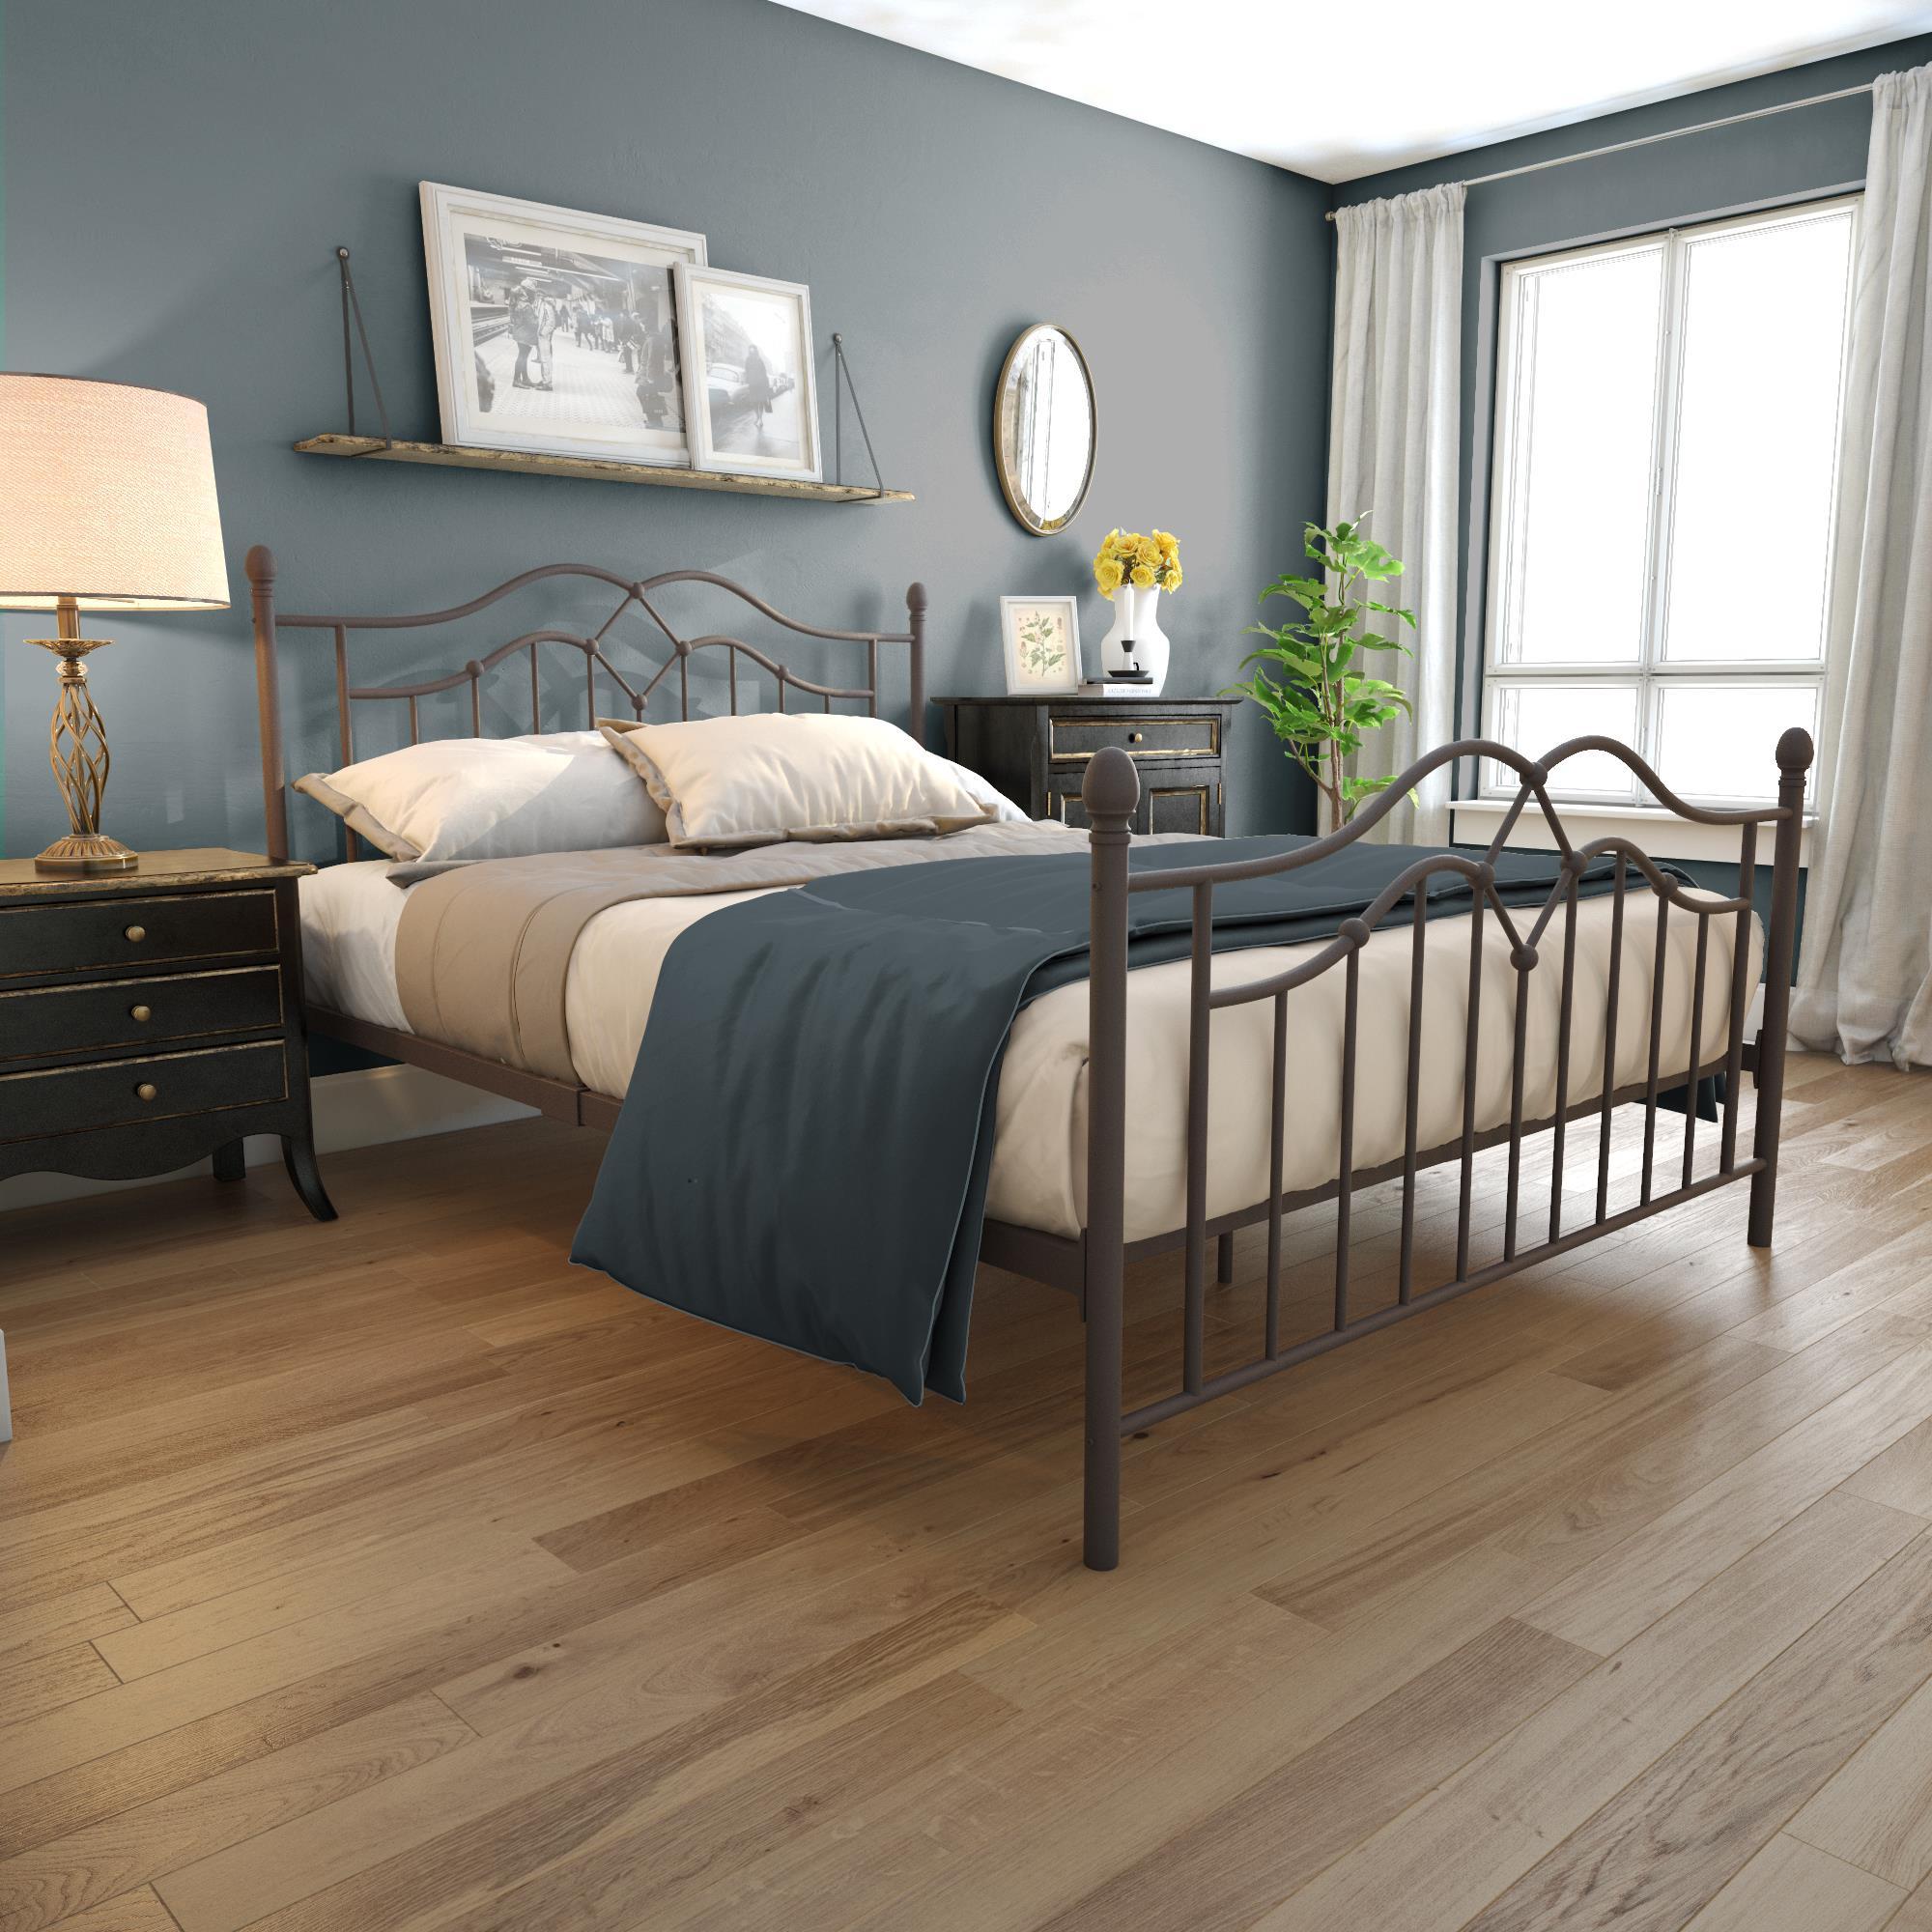 DHP Tokyo Modern Metal Bed Frame, Bronze, Multiple Sizes